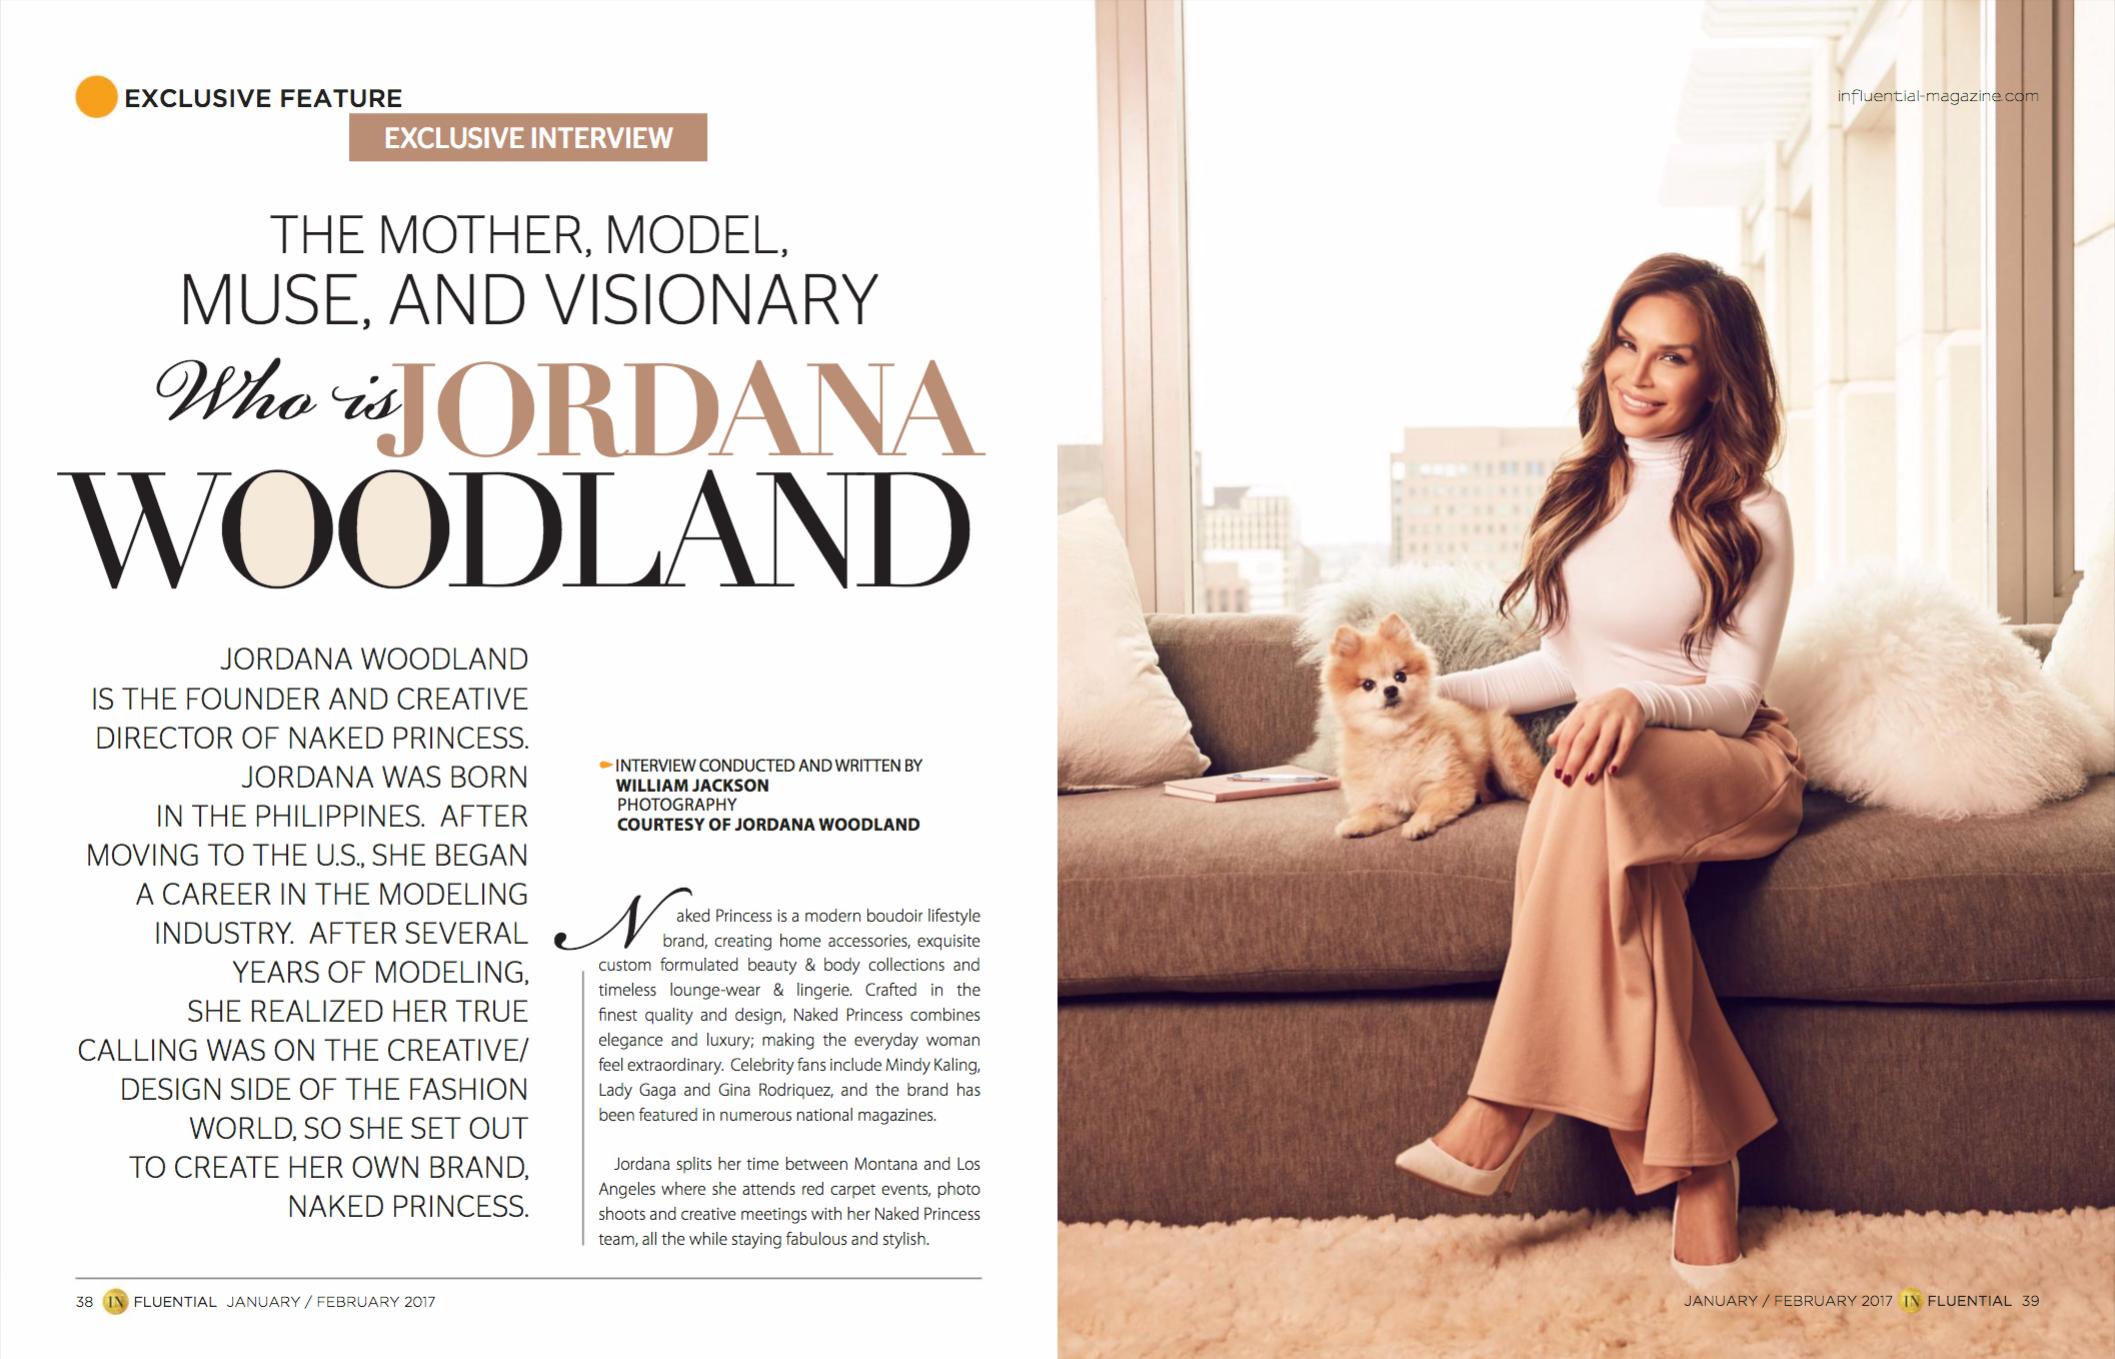 BMP Beverly Hills_Jordana Woodland_Influential Magazine_JanFeb2017_1.png